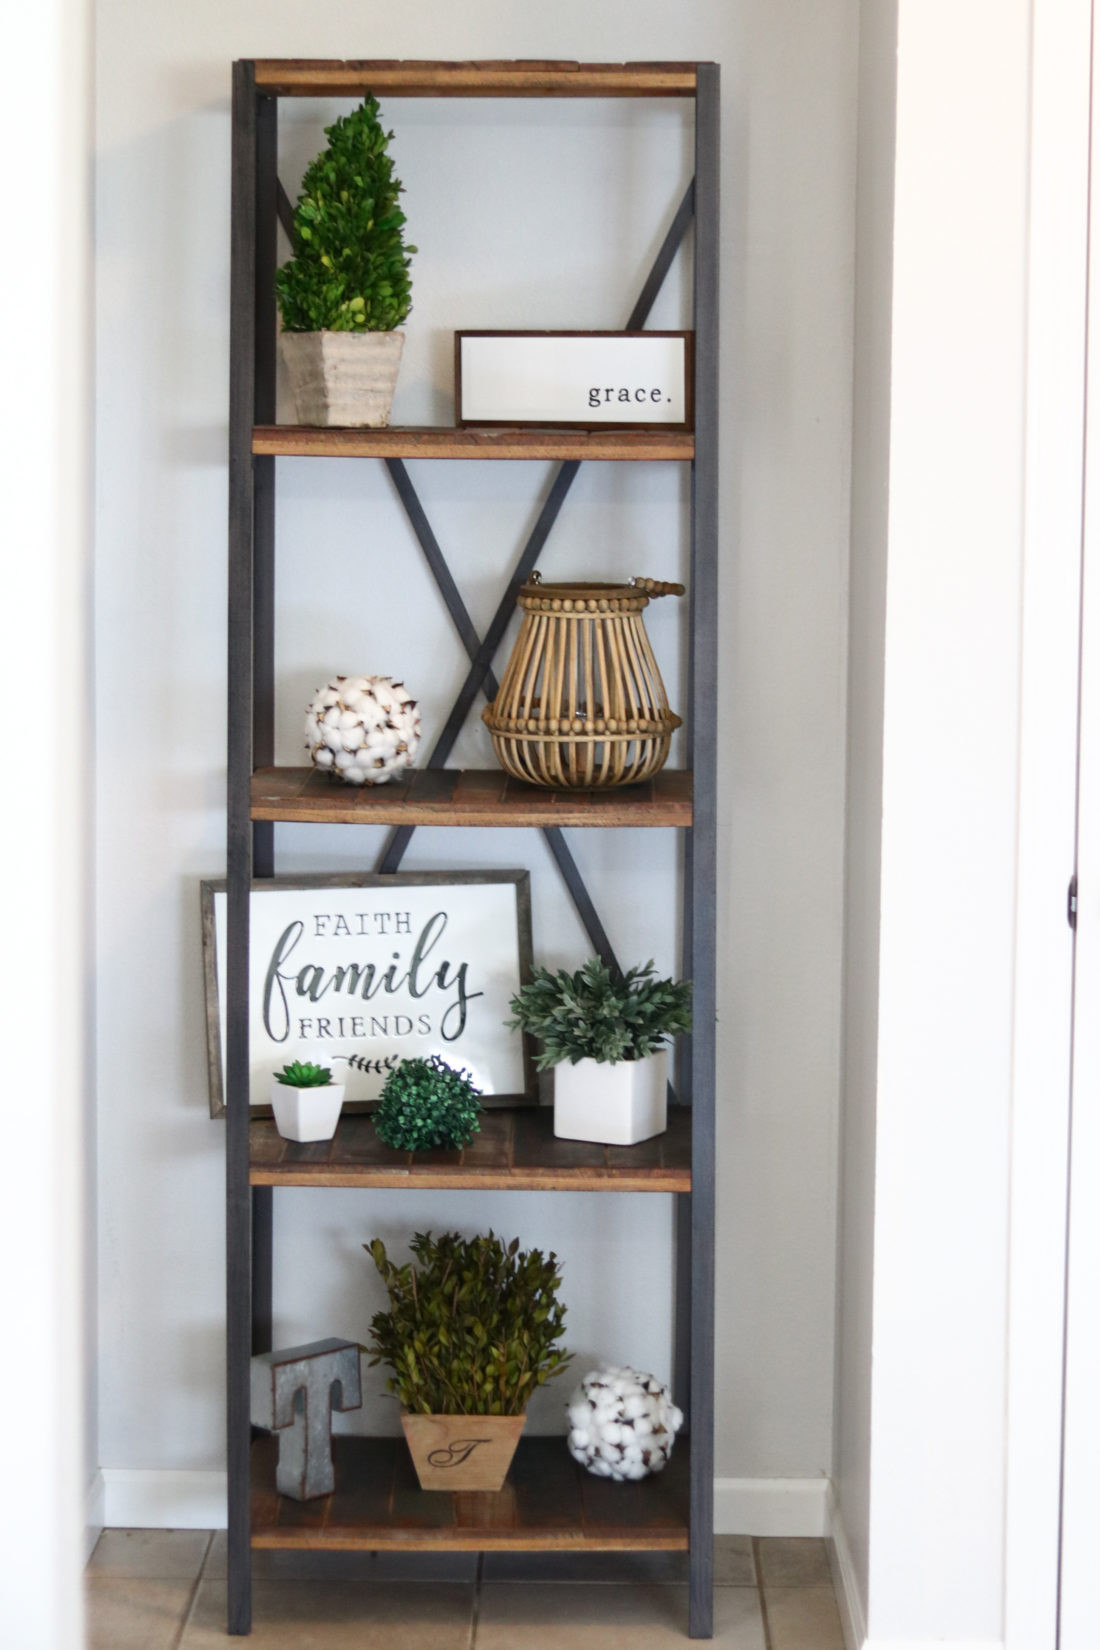 Entryway Decorating Ideas | Modern Farmhouse Decor - A ... on Farmhouse Decorating Ideas  id=36883